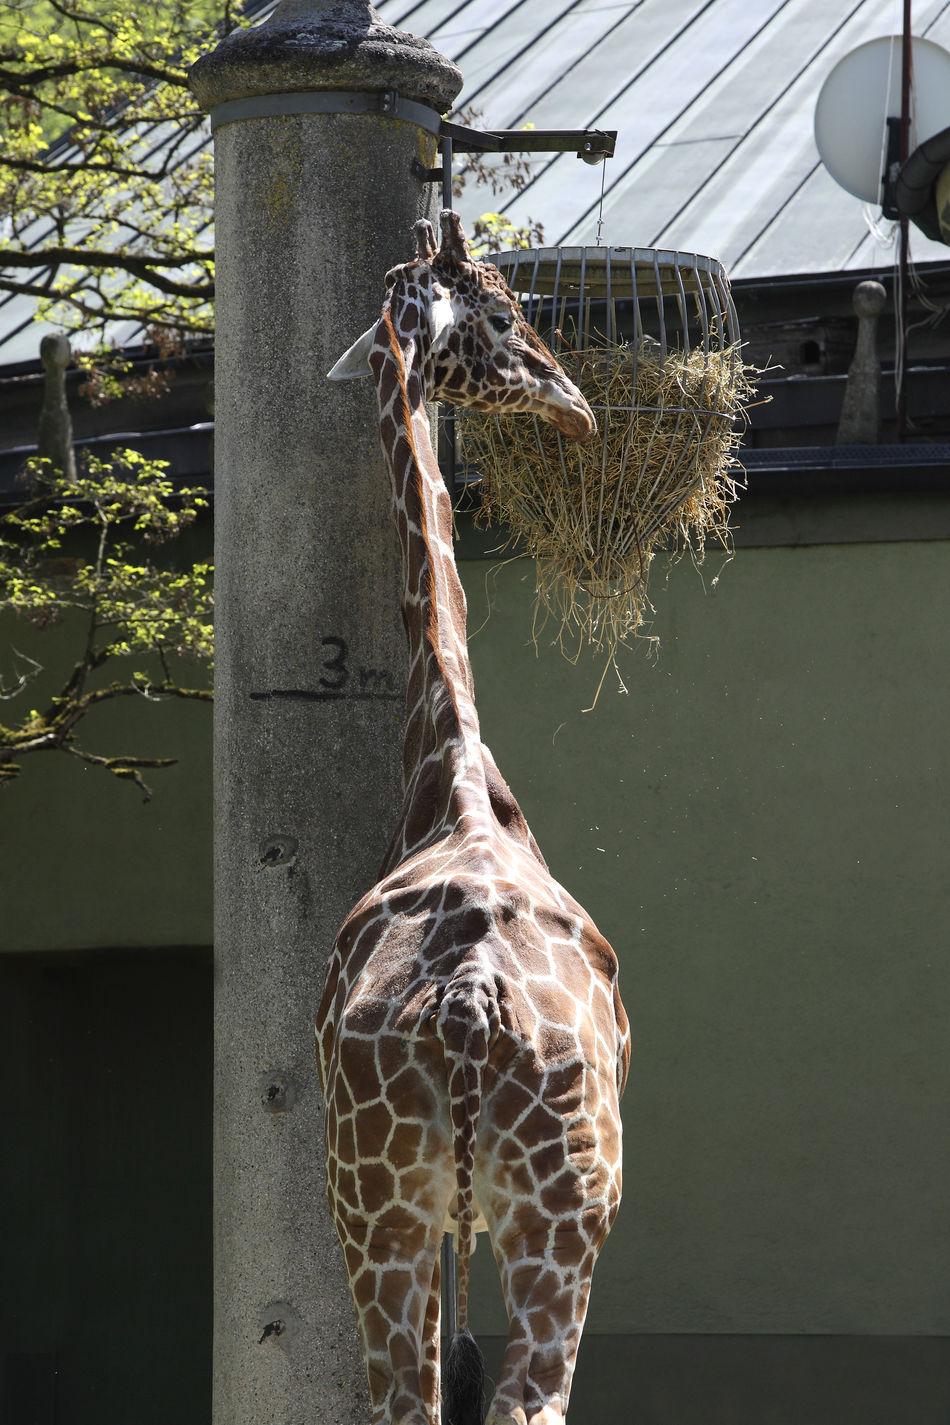 Animal Animal Themes Close-up Day Giraffe Giraffe♥ Nature No People One Animal Outdoors Tree